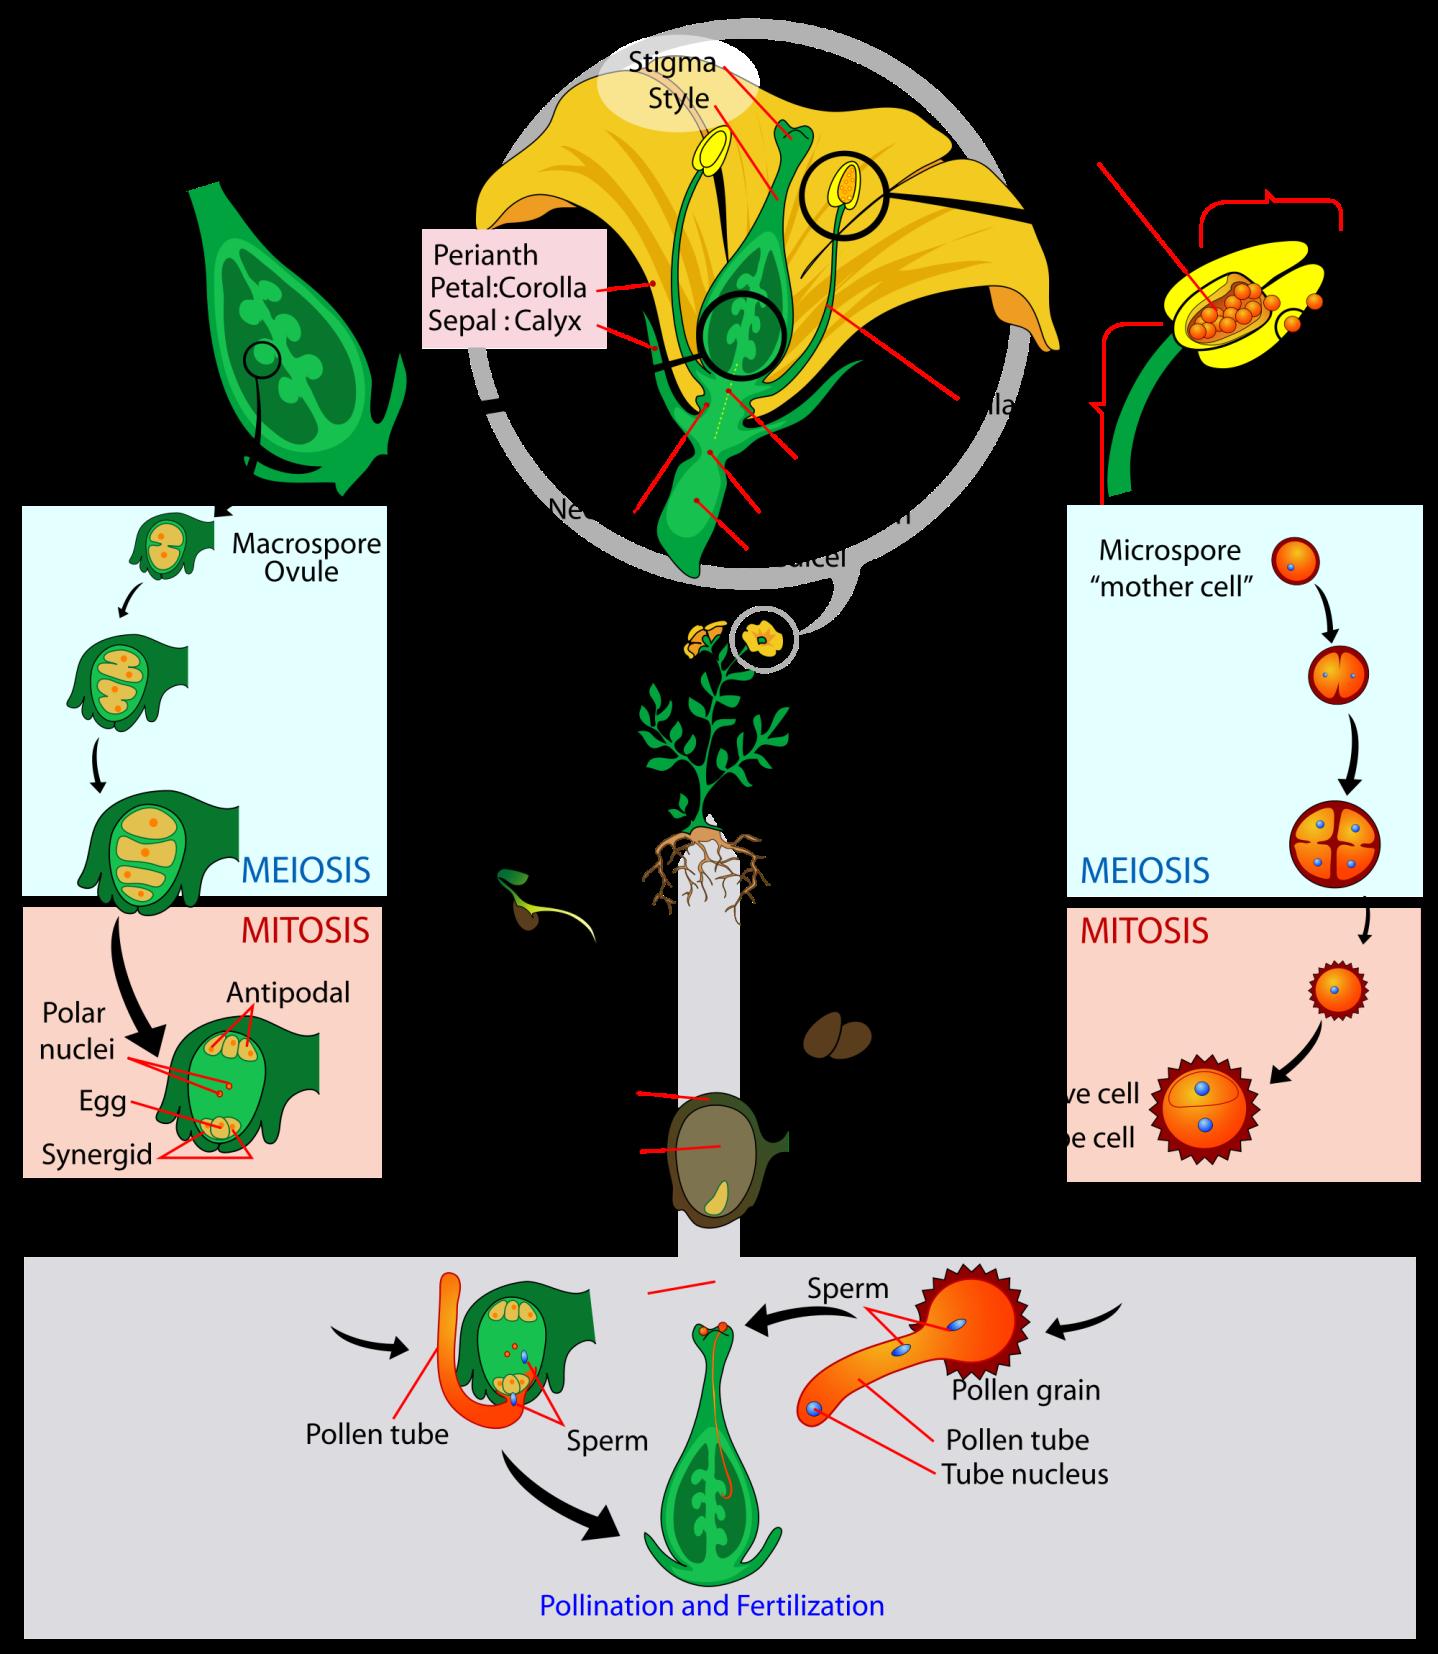 Procesul de polenizare si fecundare - sursa wikipedia